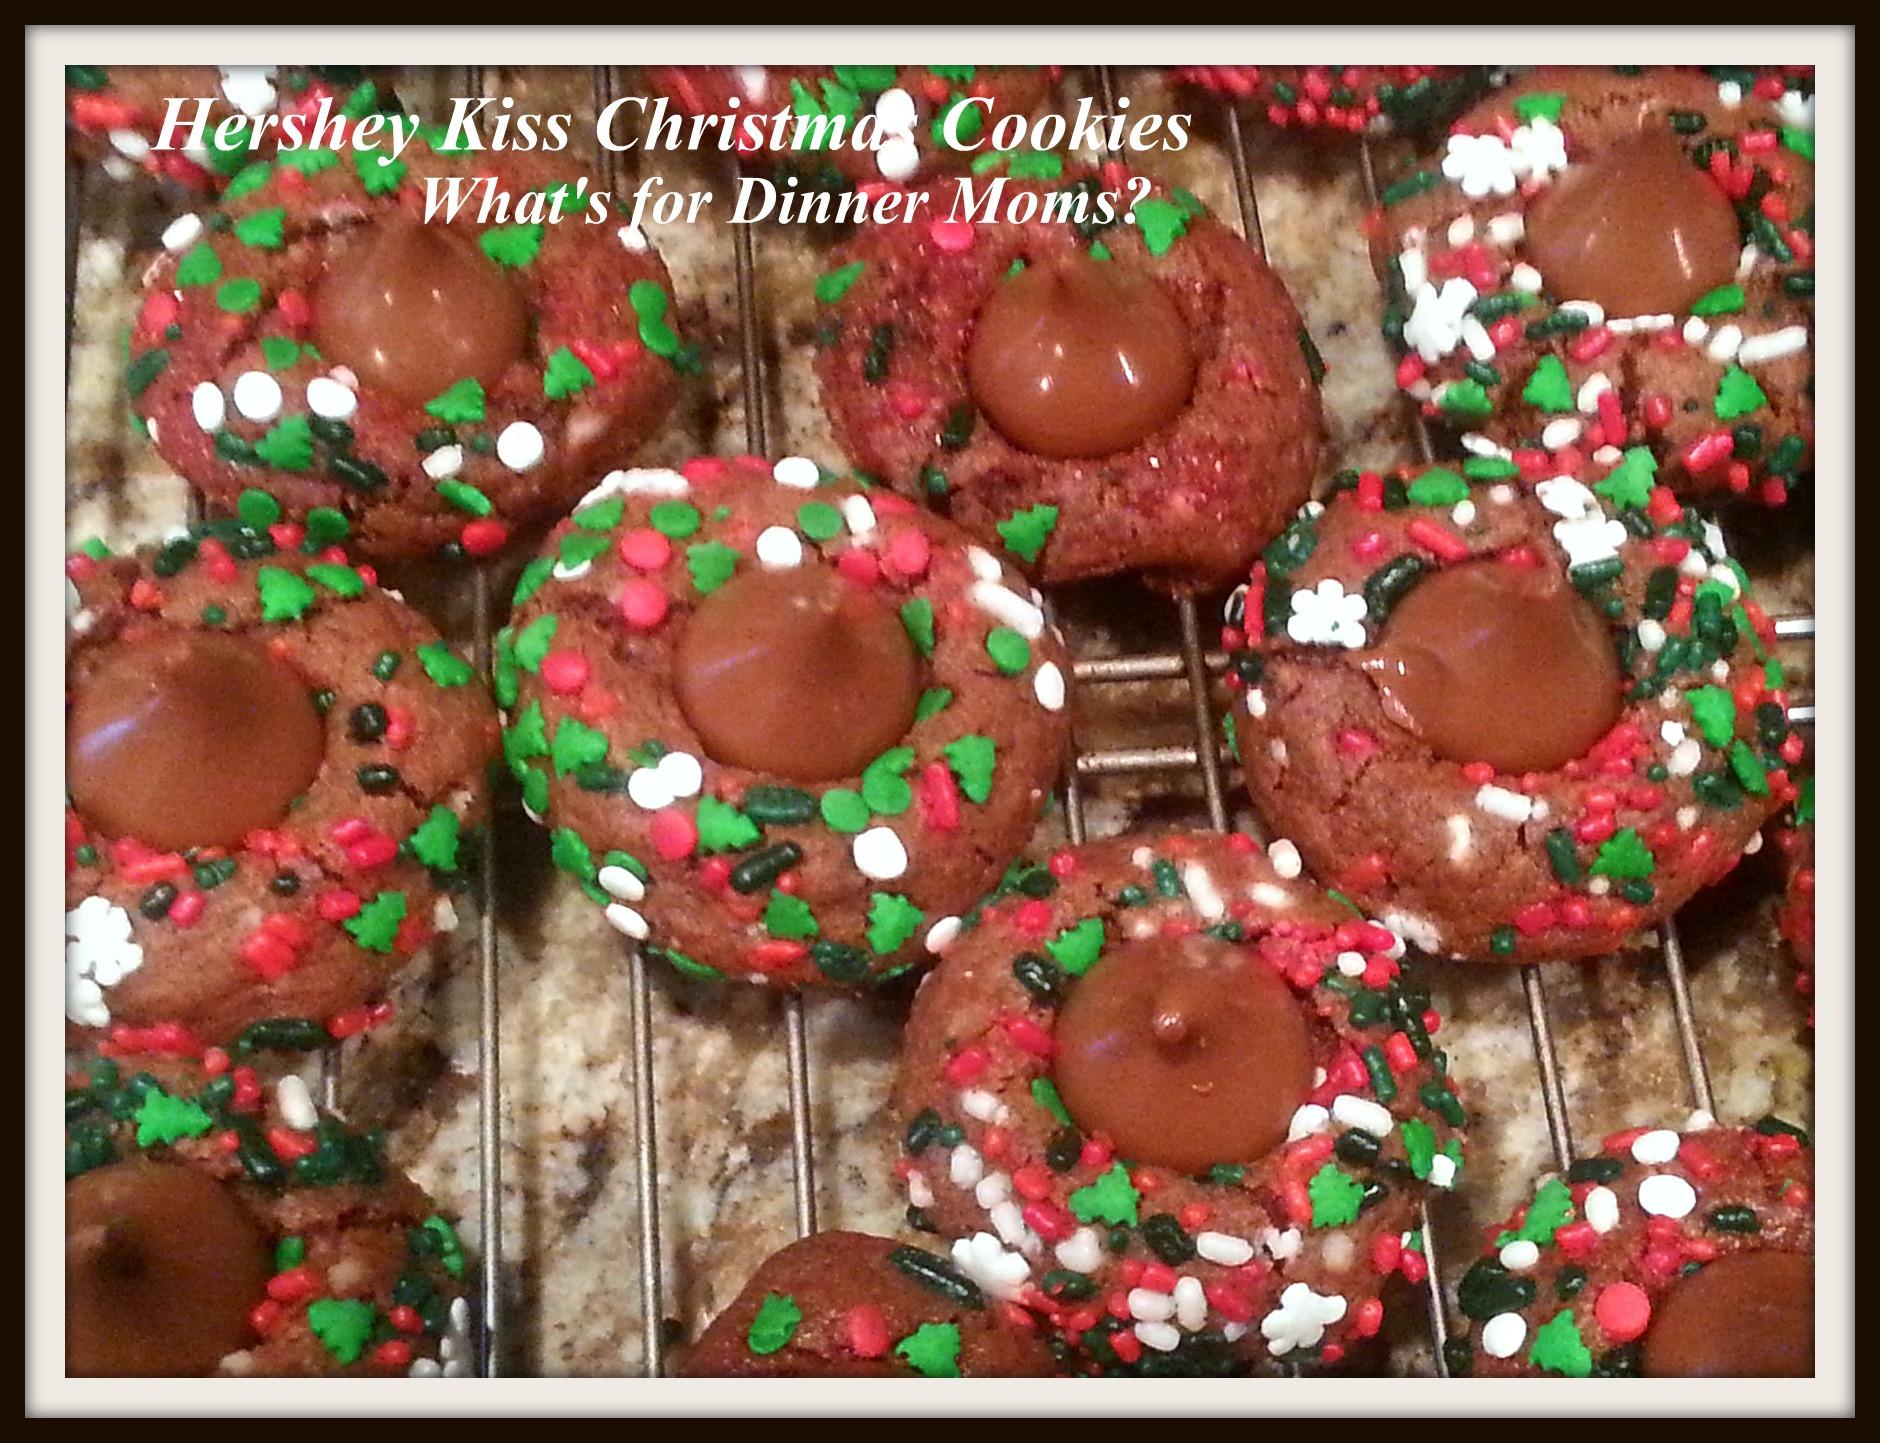 Hershey Kisses Christmas Cookies  Hershey Kiss Christmas Cookies – What s for Dinner Moms